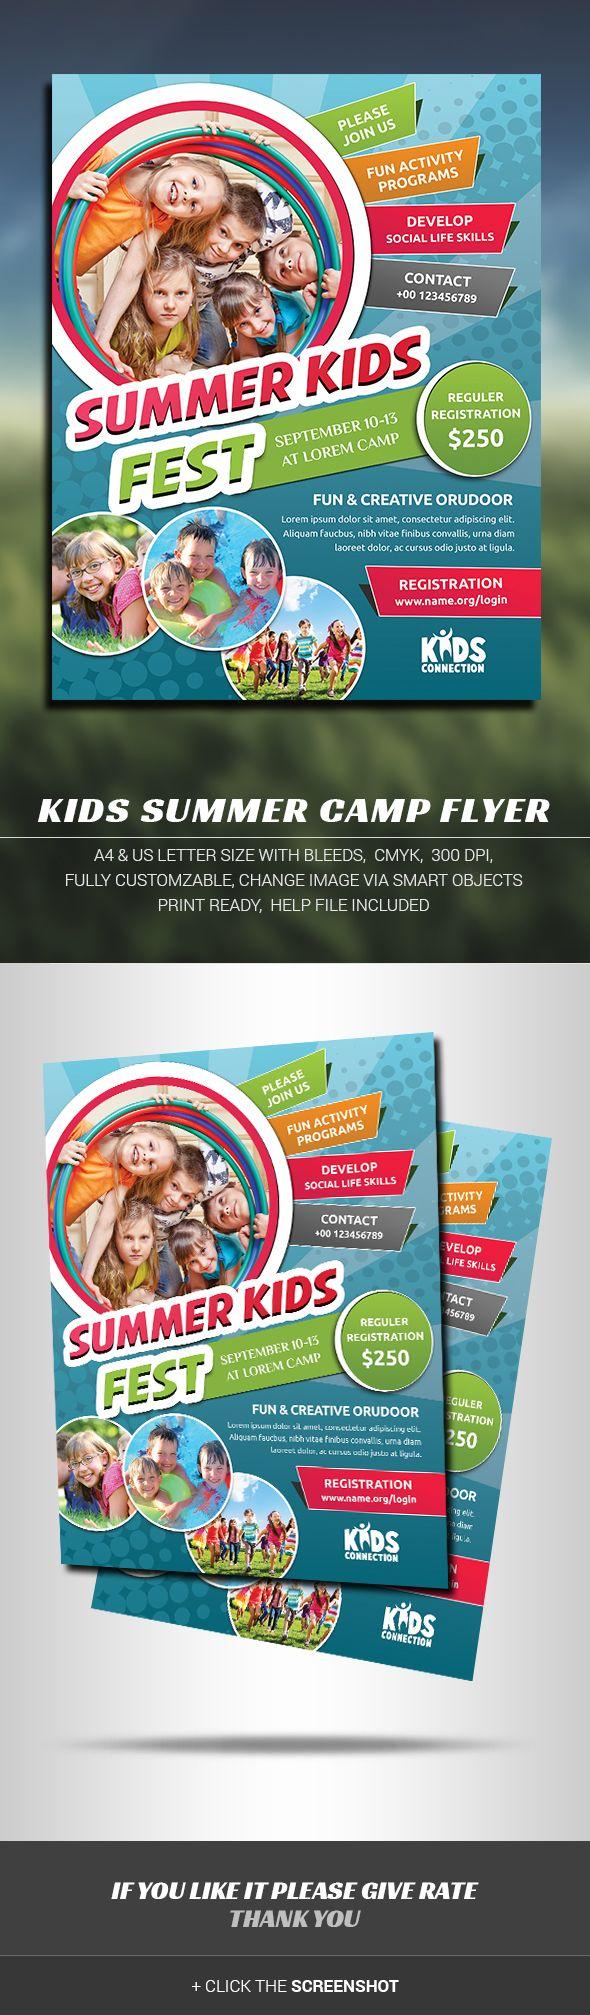 Kids Summer Camp Flyer on Behance